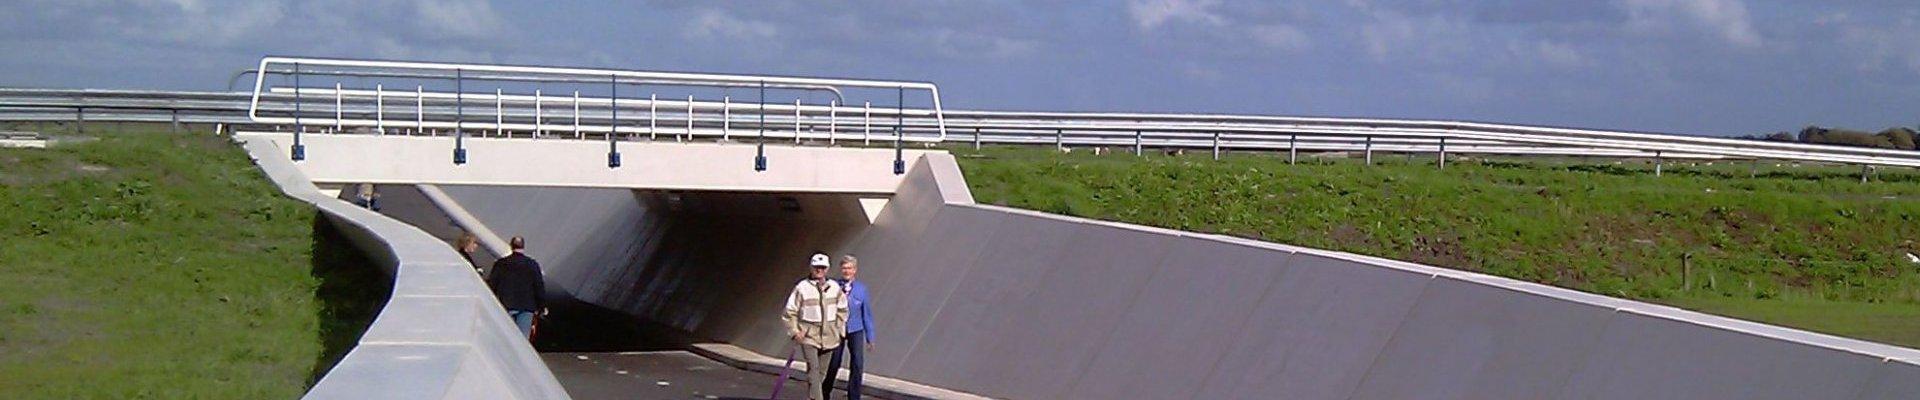 Tunnel-Castricum-N203-0011920x400